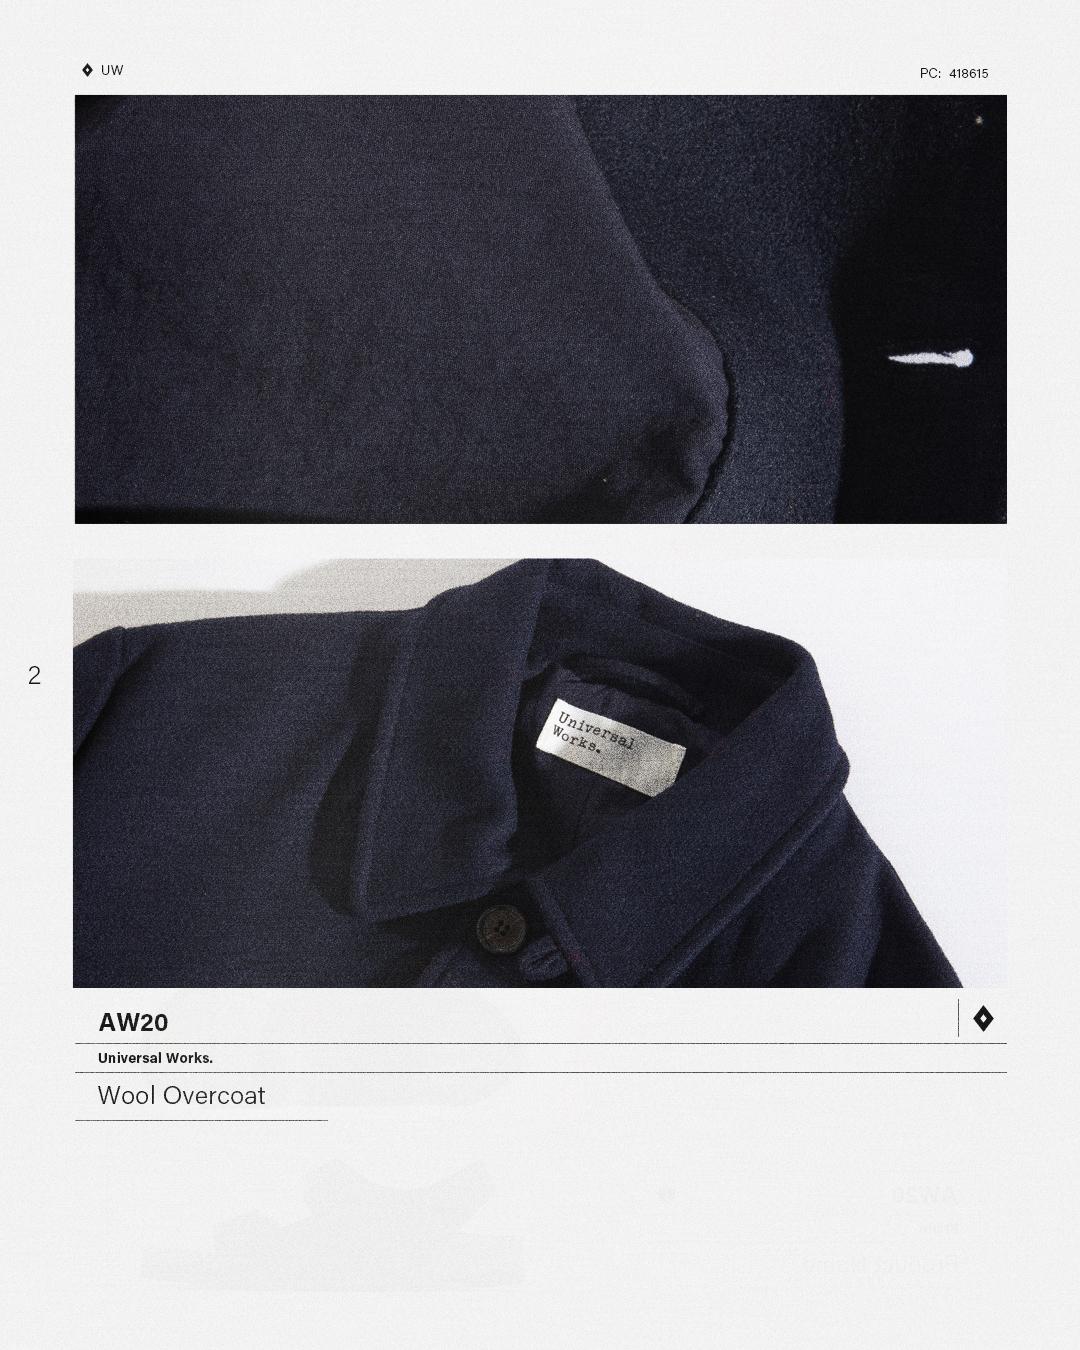 HIP Staff Picks: Universal Works AW20 Wool Overcoat